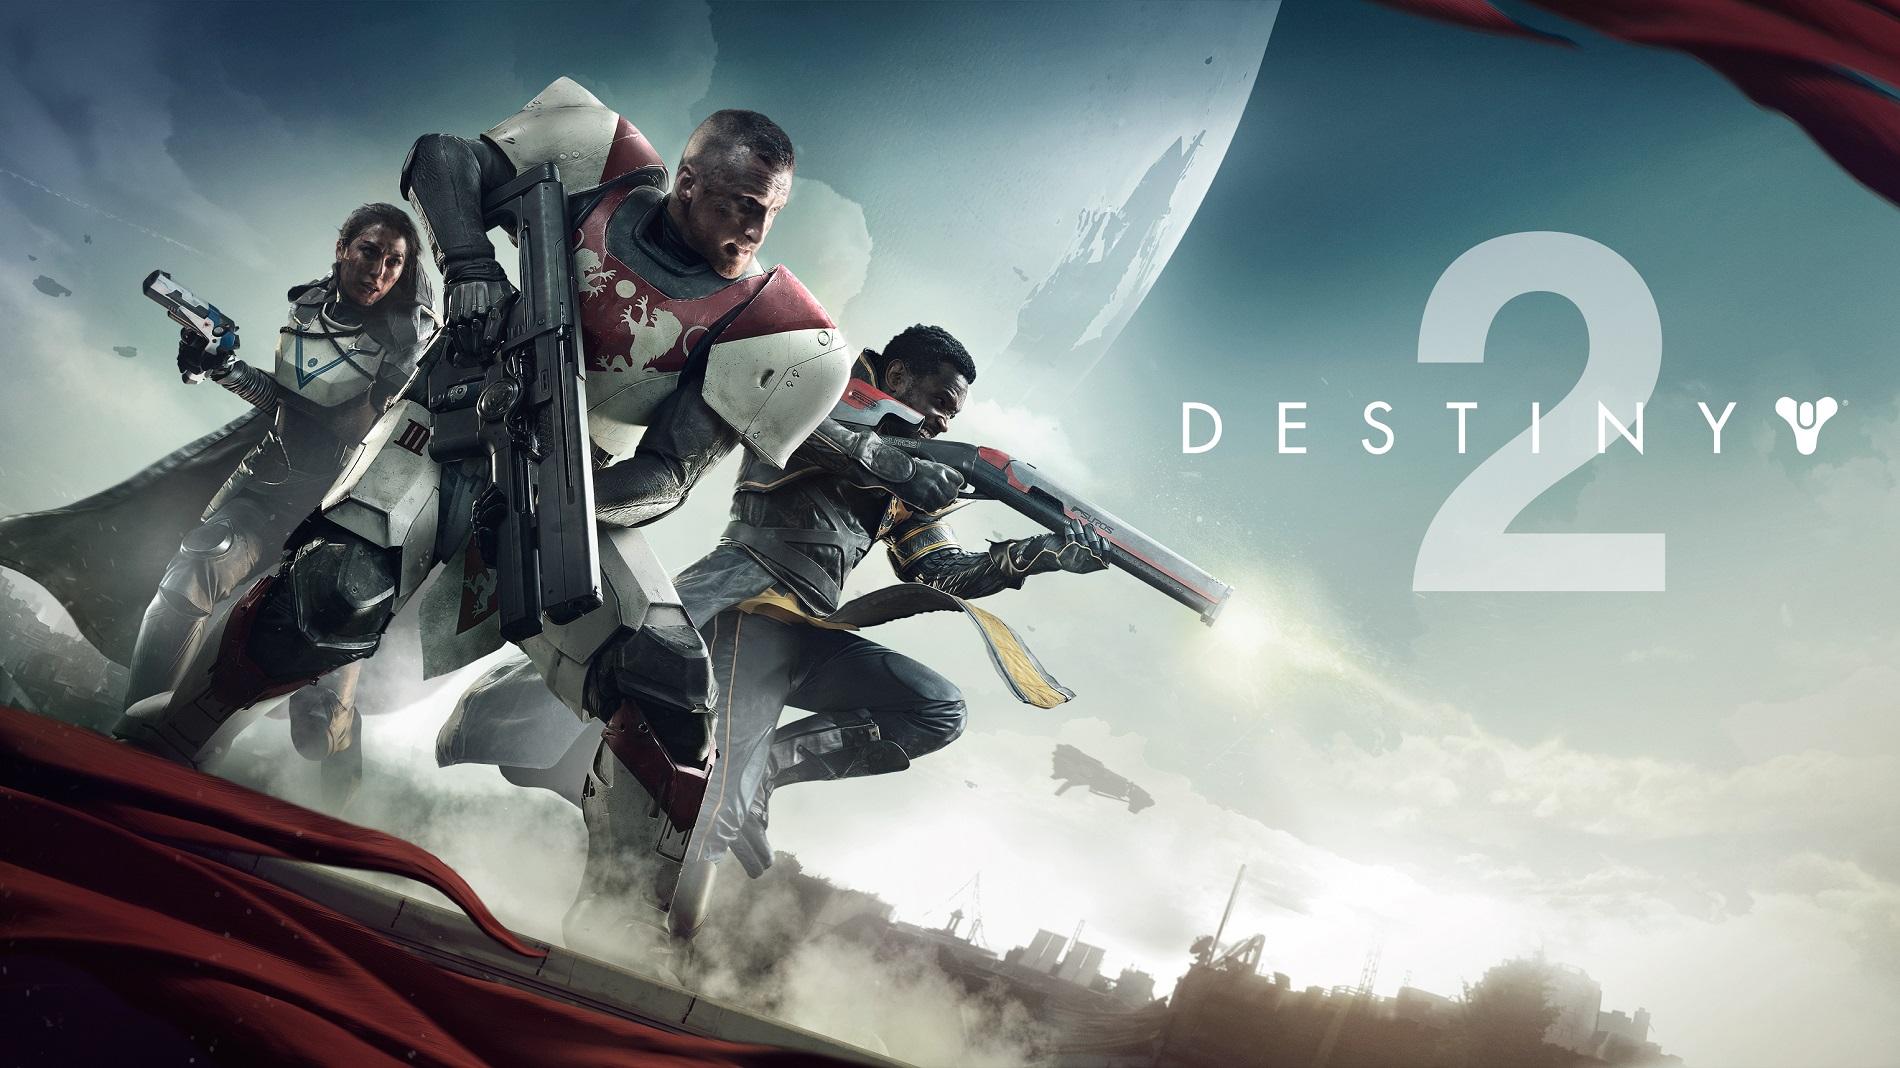 Destiny-2-Official-Reveal-Art.jpg